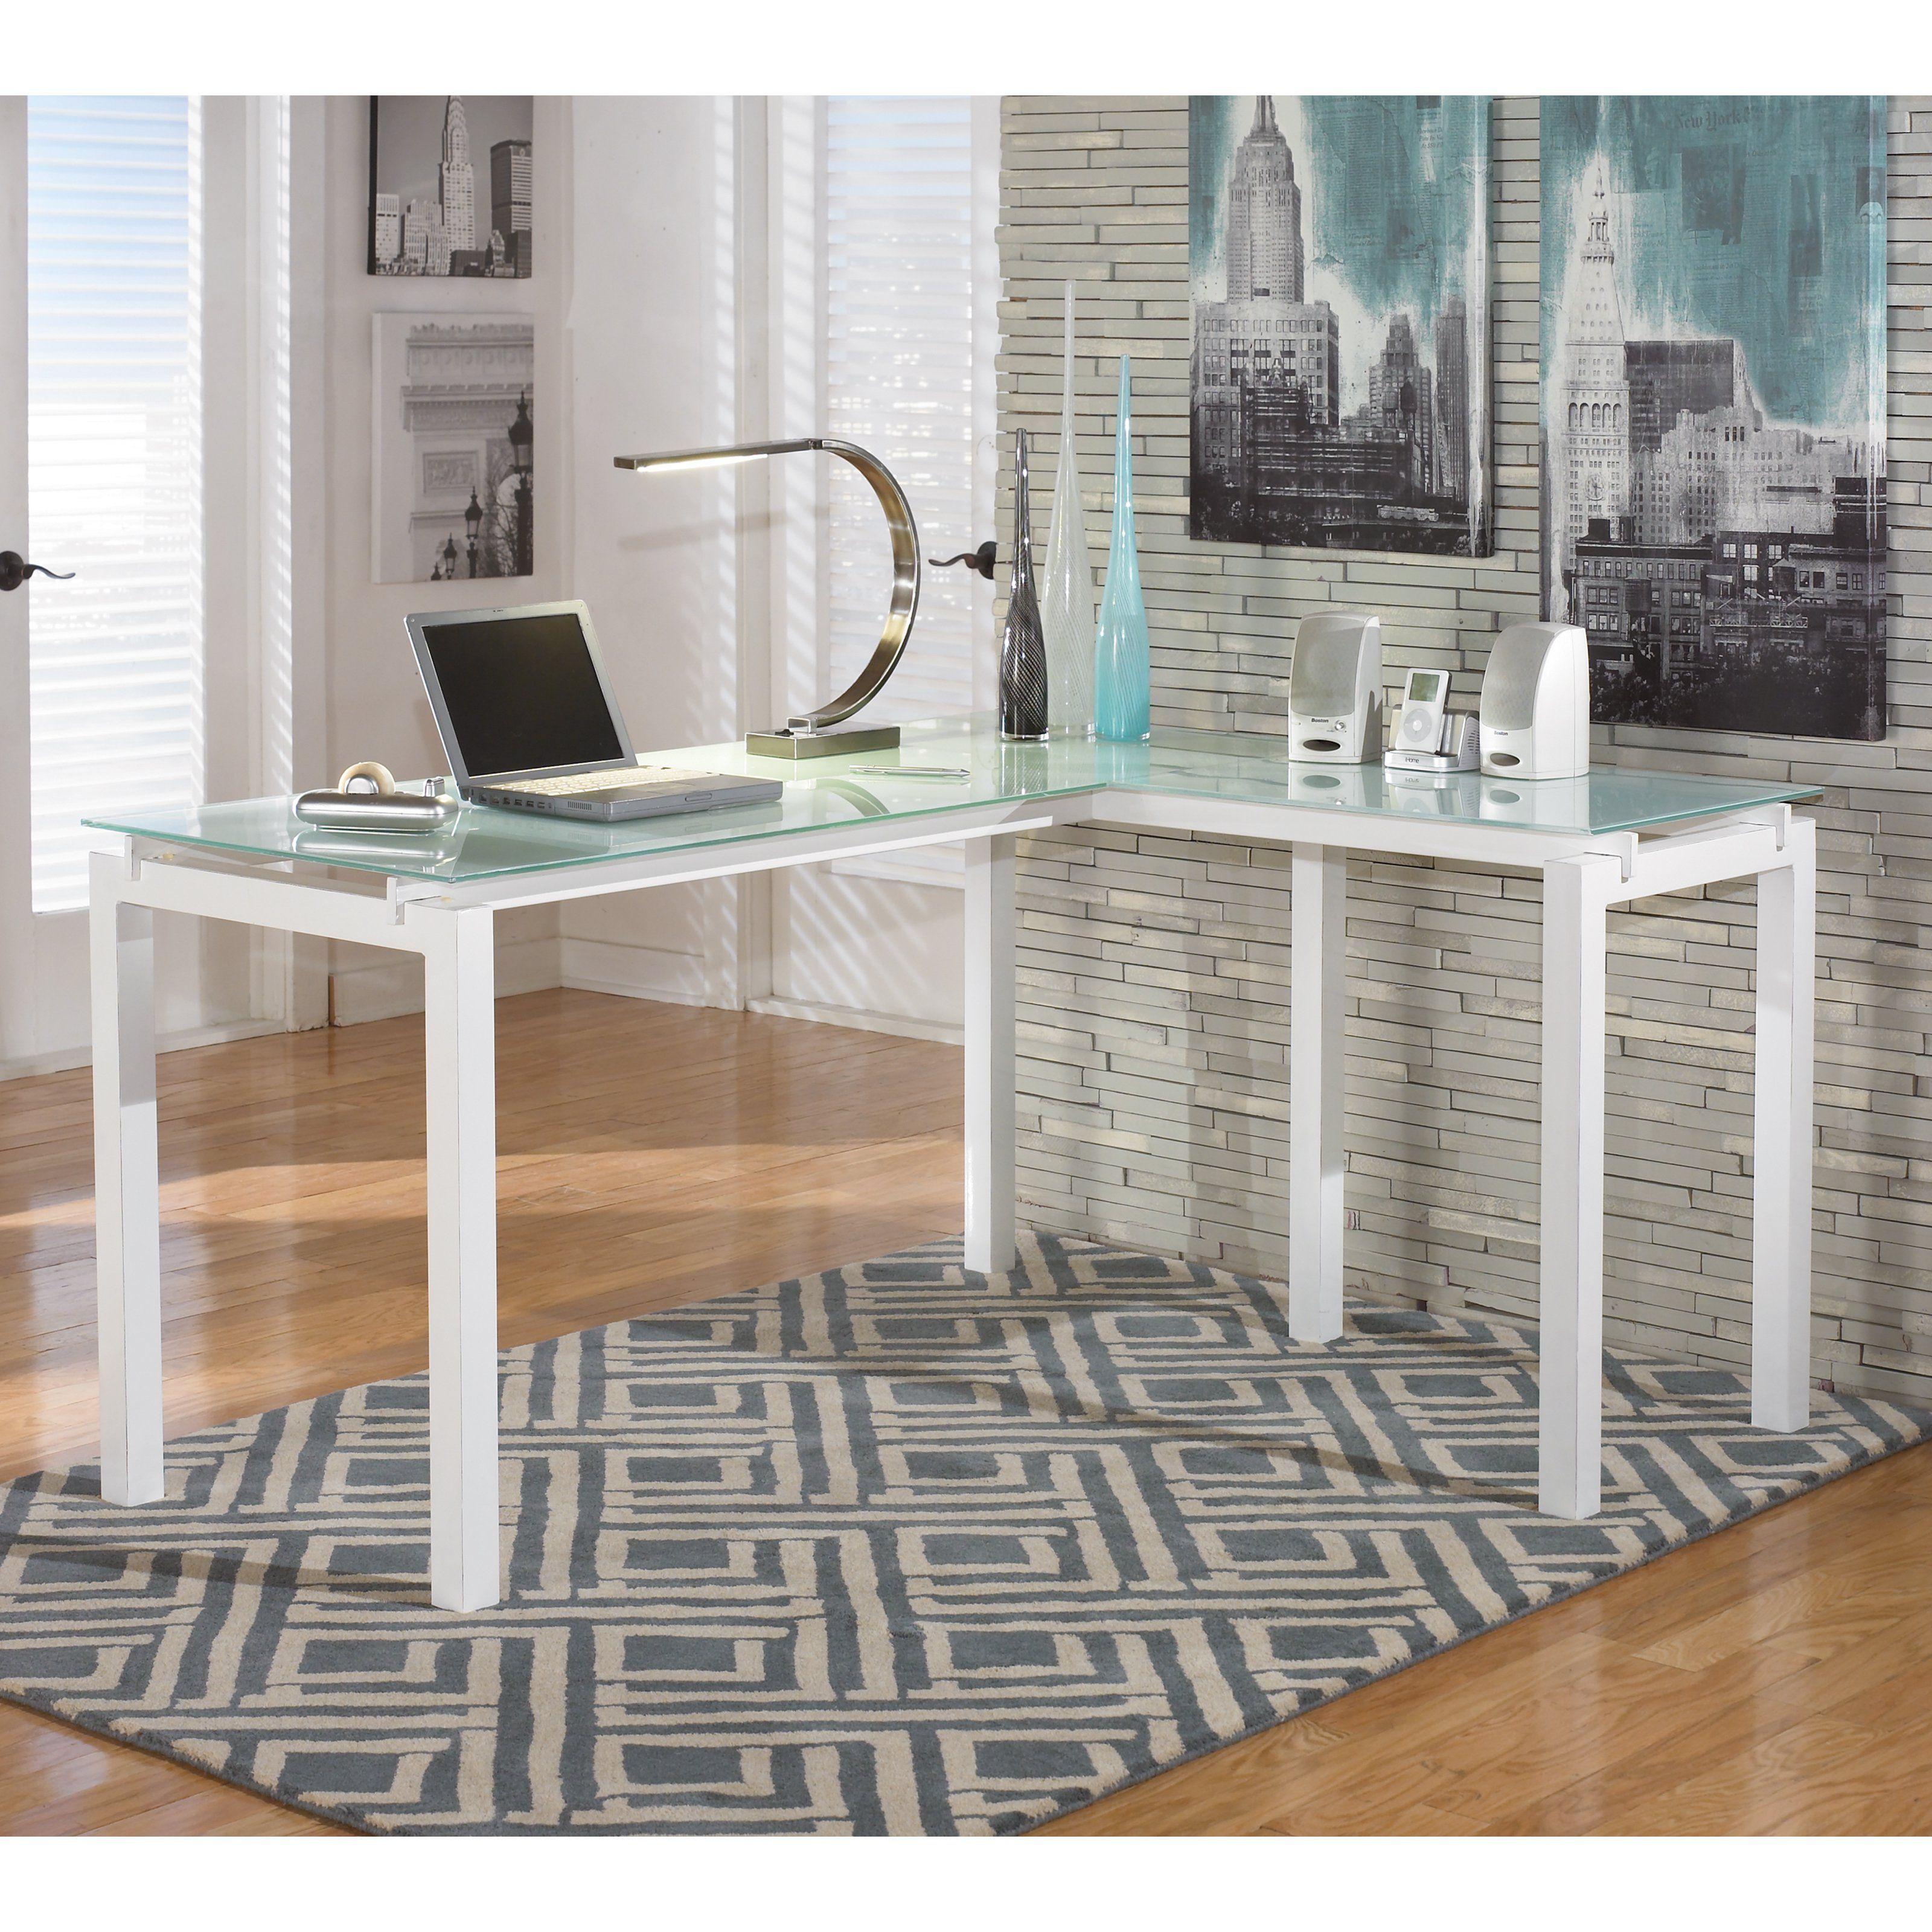 Signature design by ashley baraga lshaped desk h products